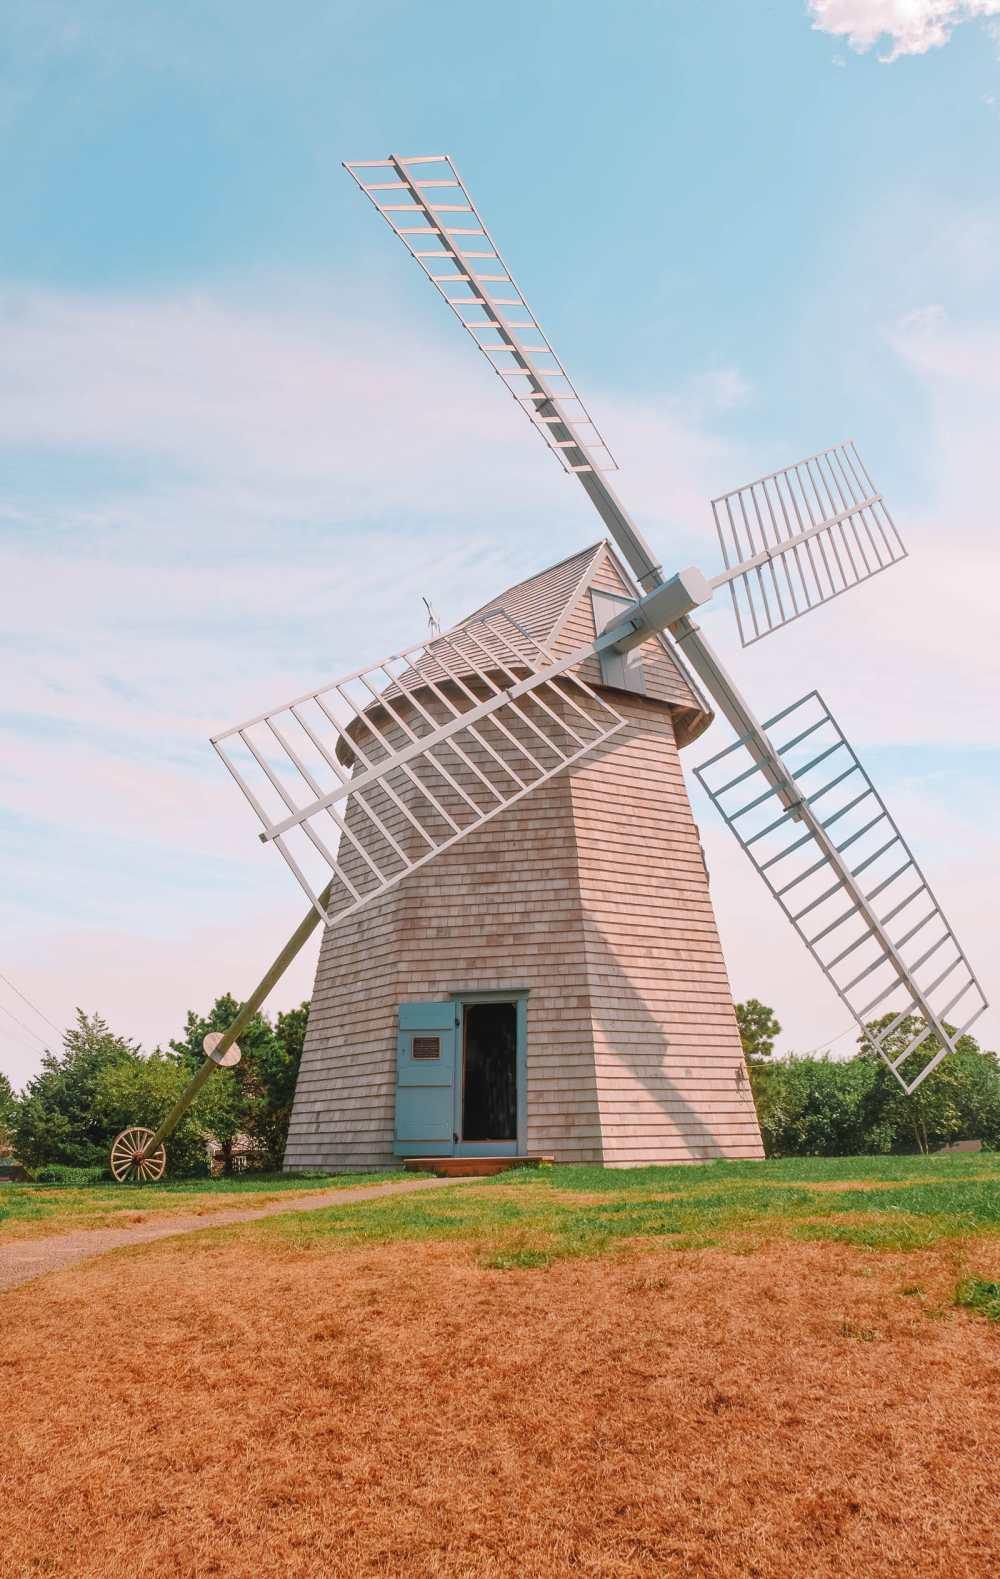 Ветряная мельница на Кейп-Коде в Массачусетсе